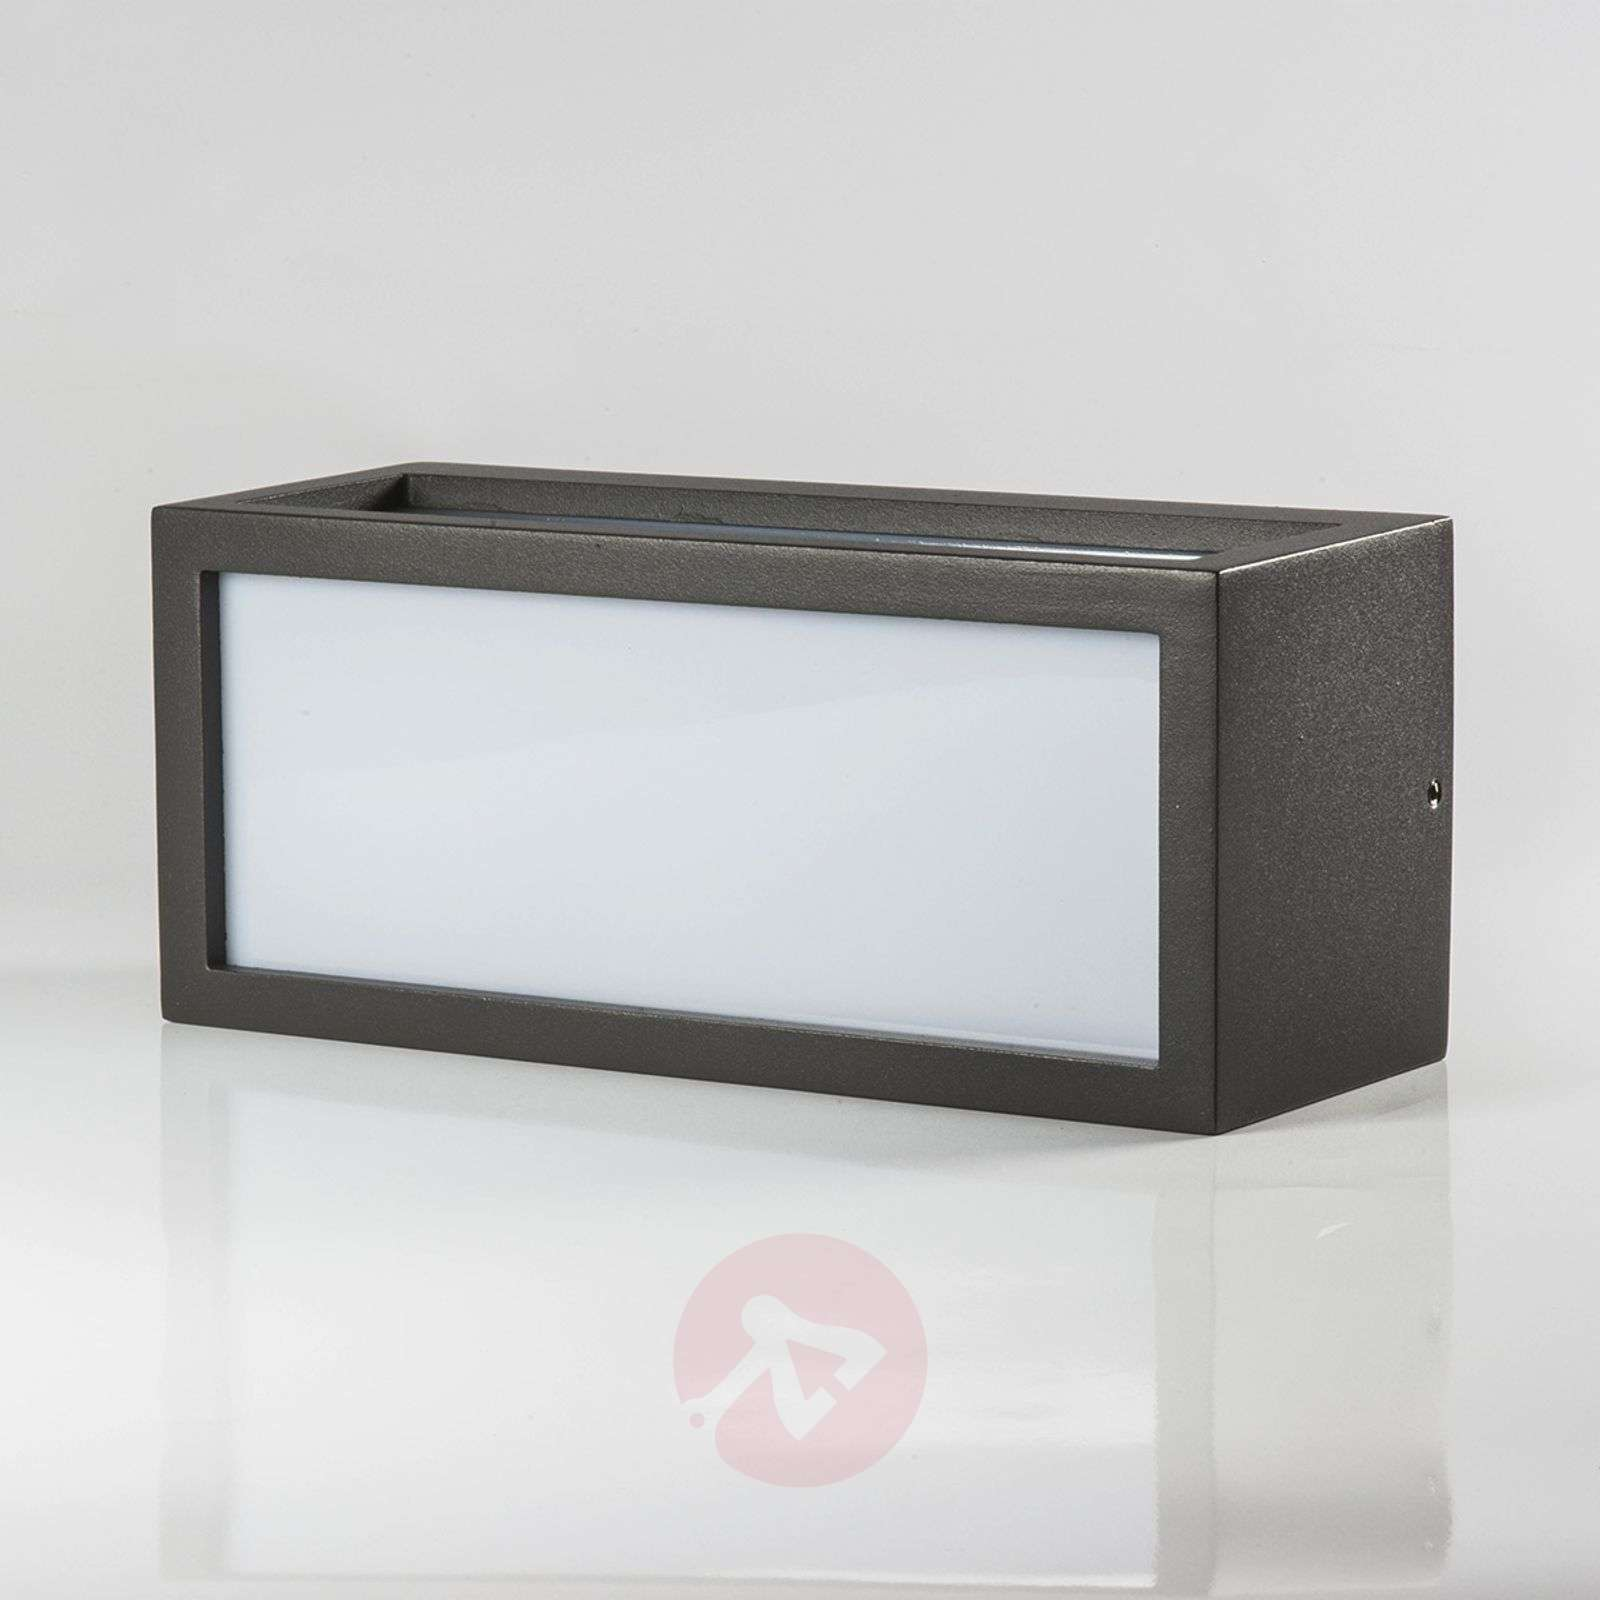 Decorative energy-saving outdoor wall light Tame-9616030-01